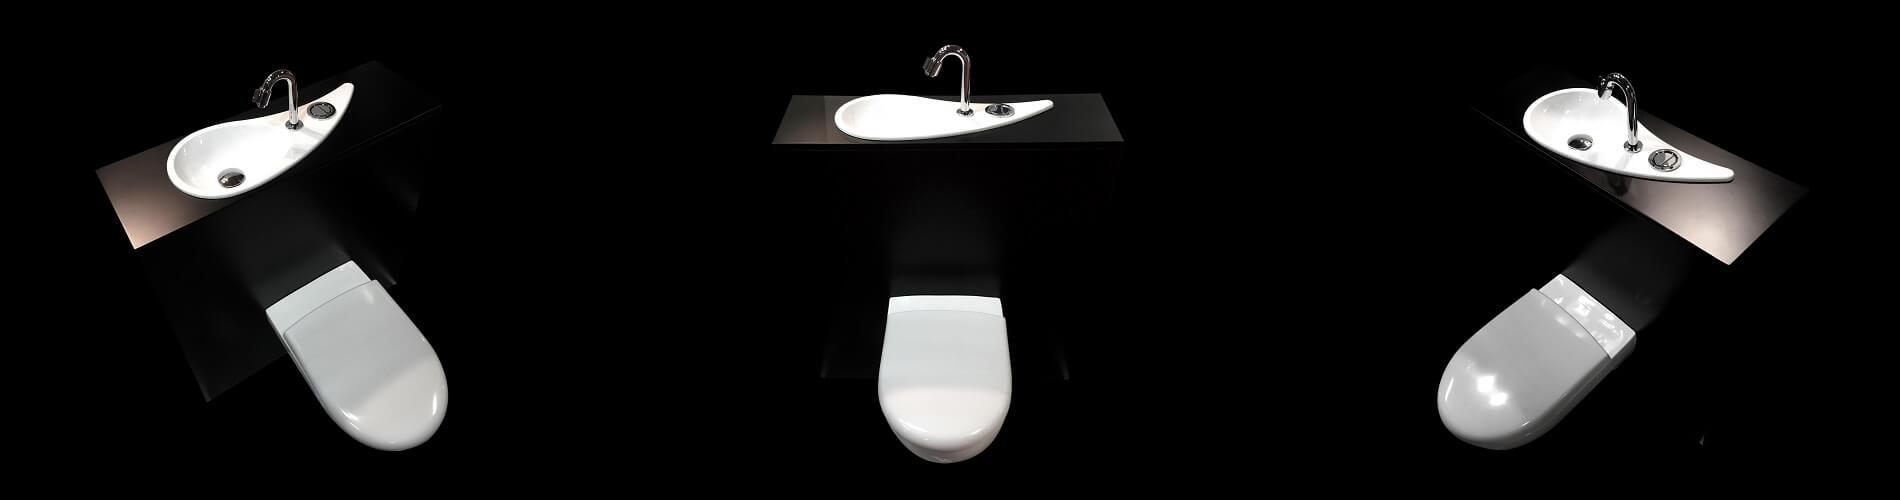 WiCi Free Flush, WC suspendu Geberit avec lave-main design